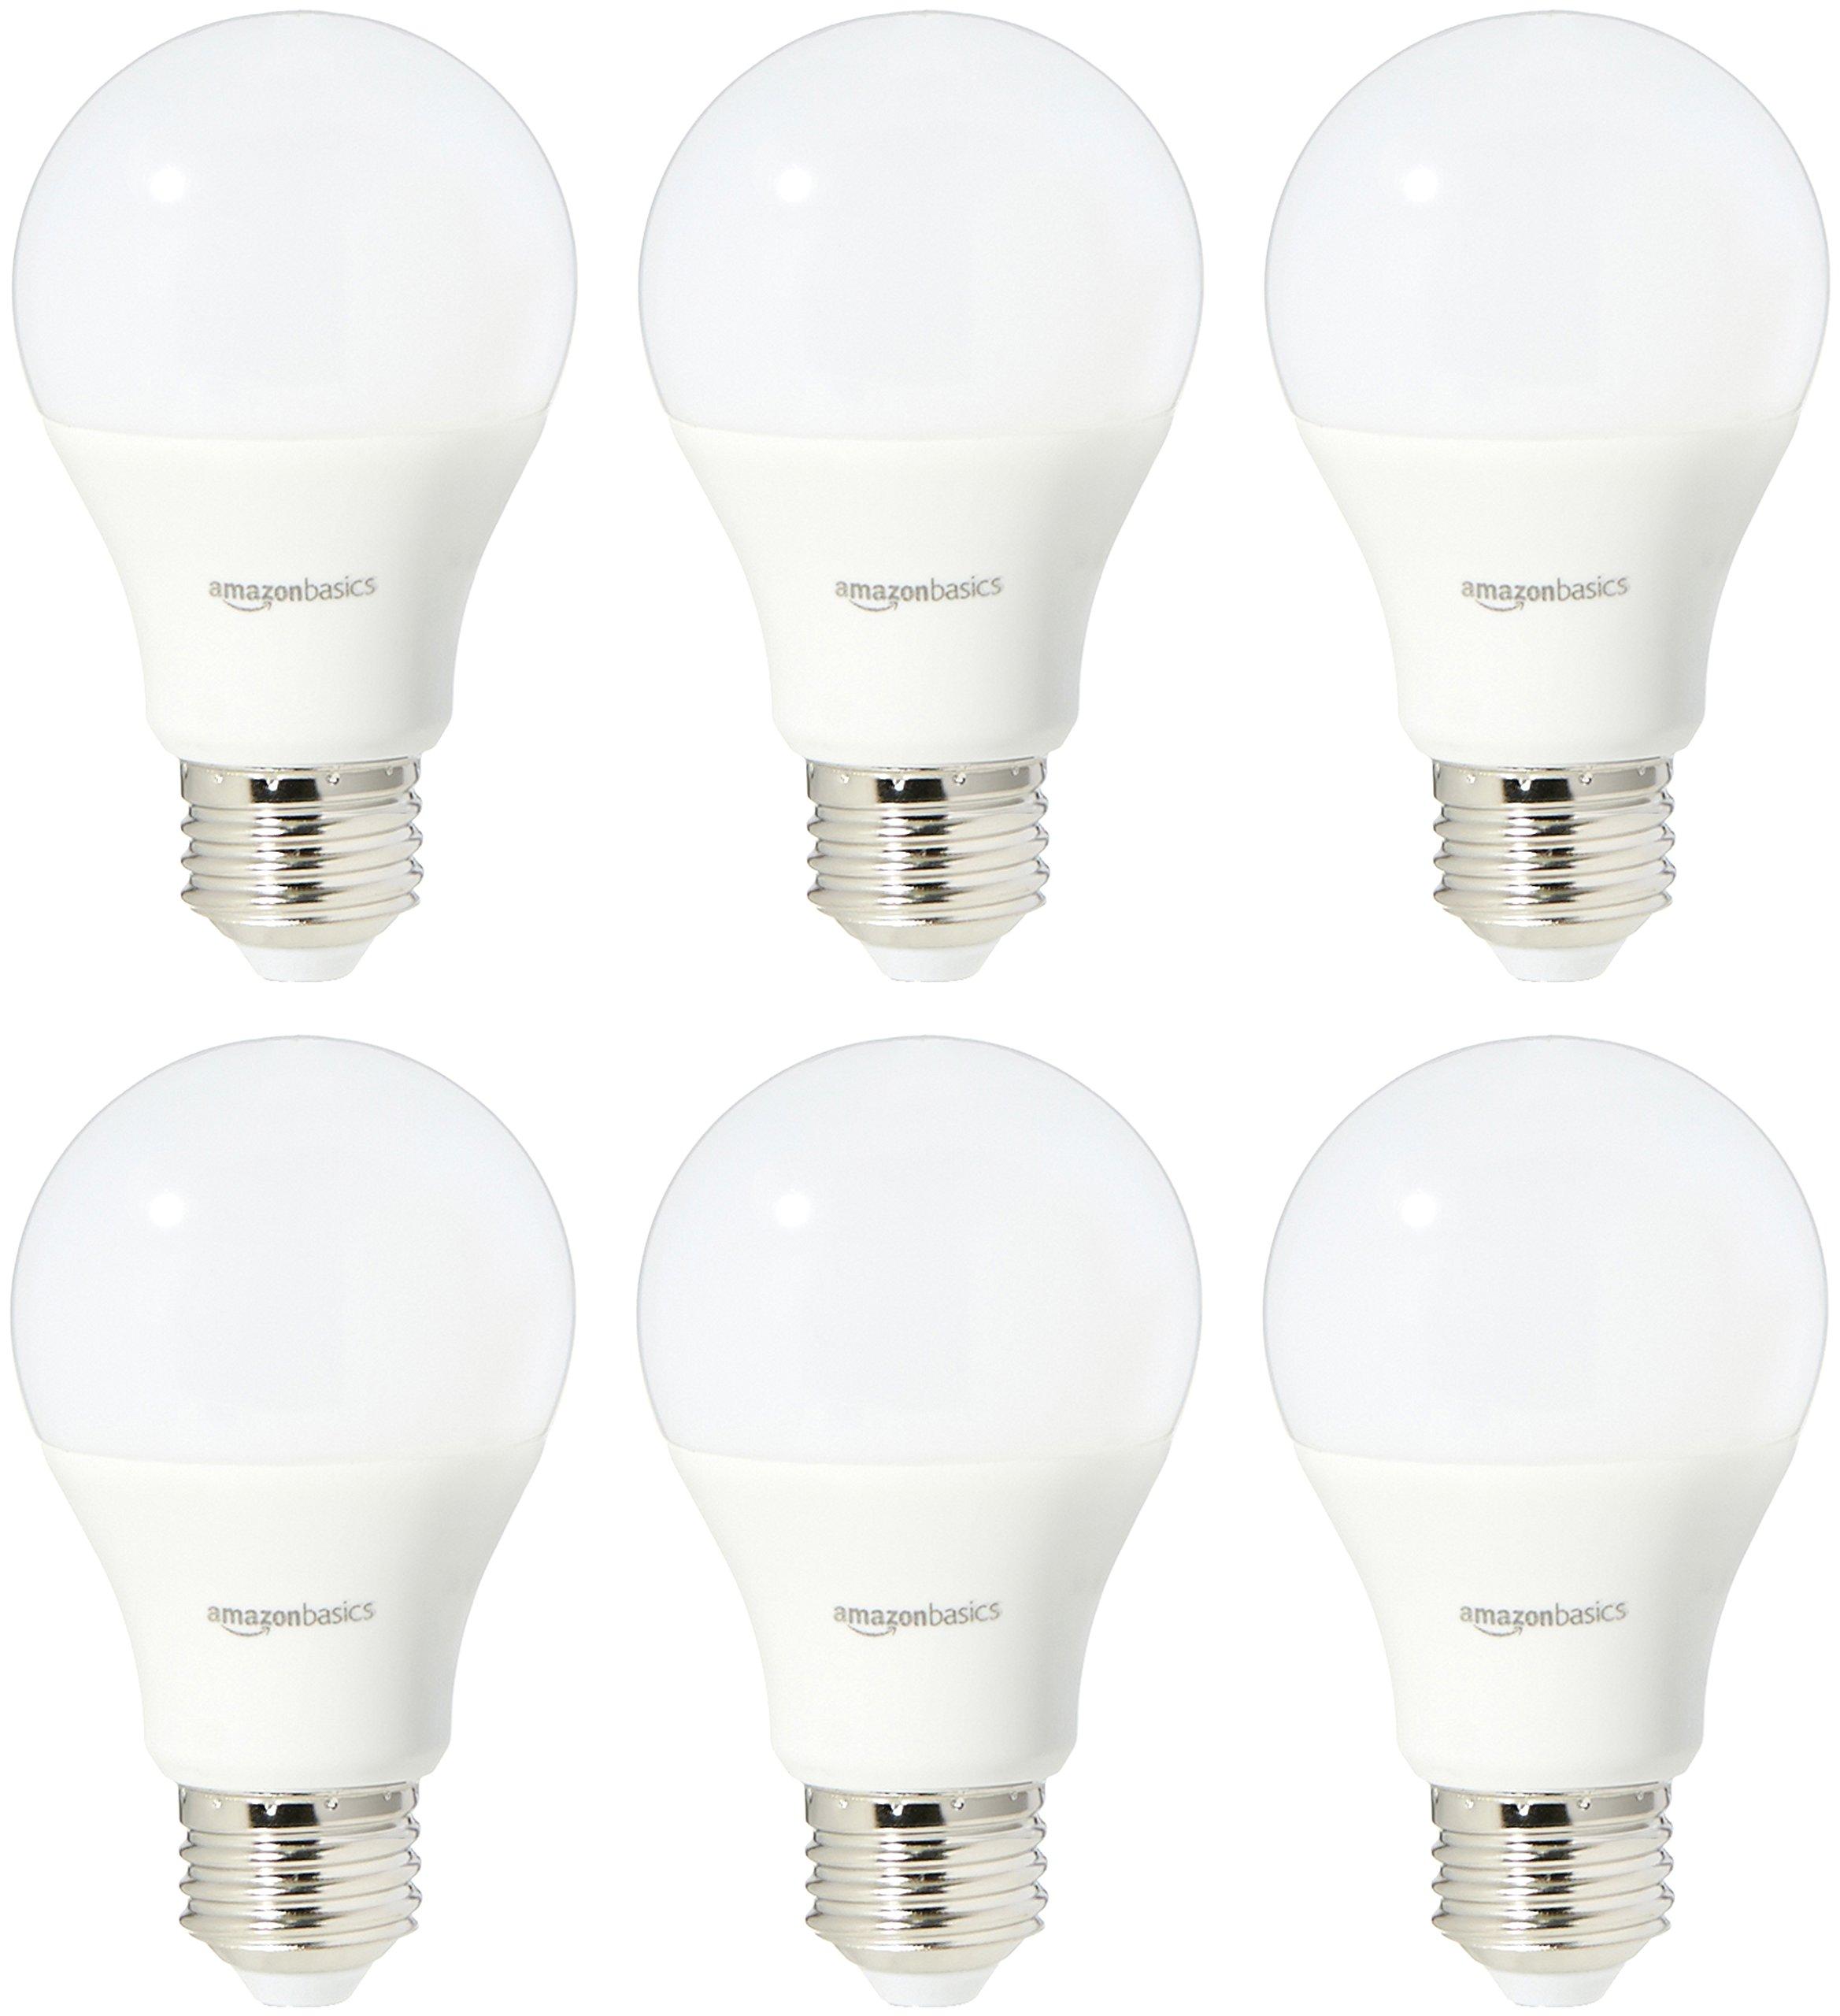 AmazonBasics 60 Watt Equivalent, Soft White, Dimmable, A19 LED Light Bulb | 6-Pack